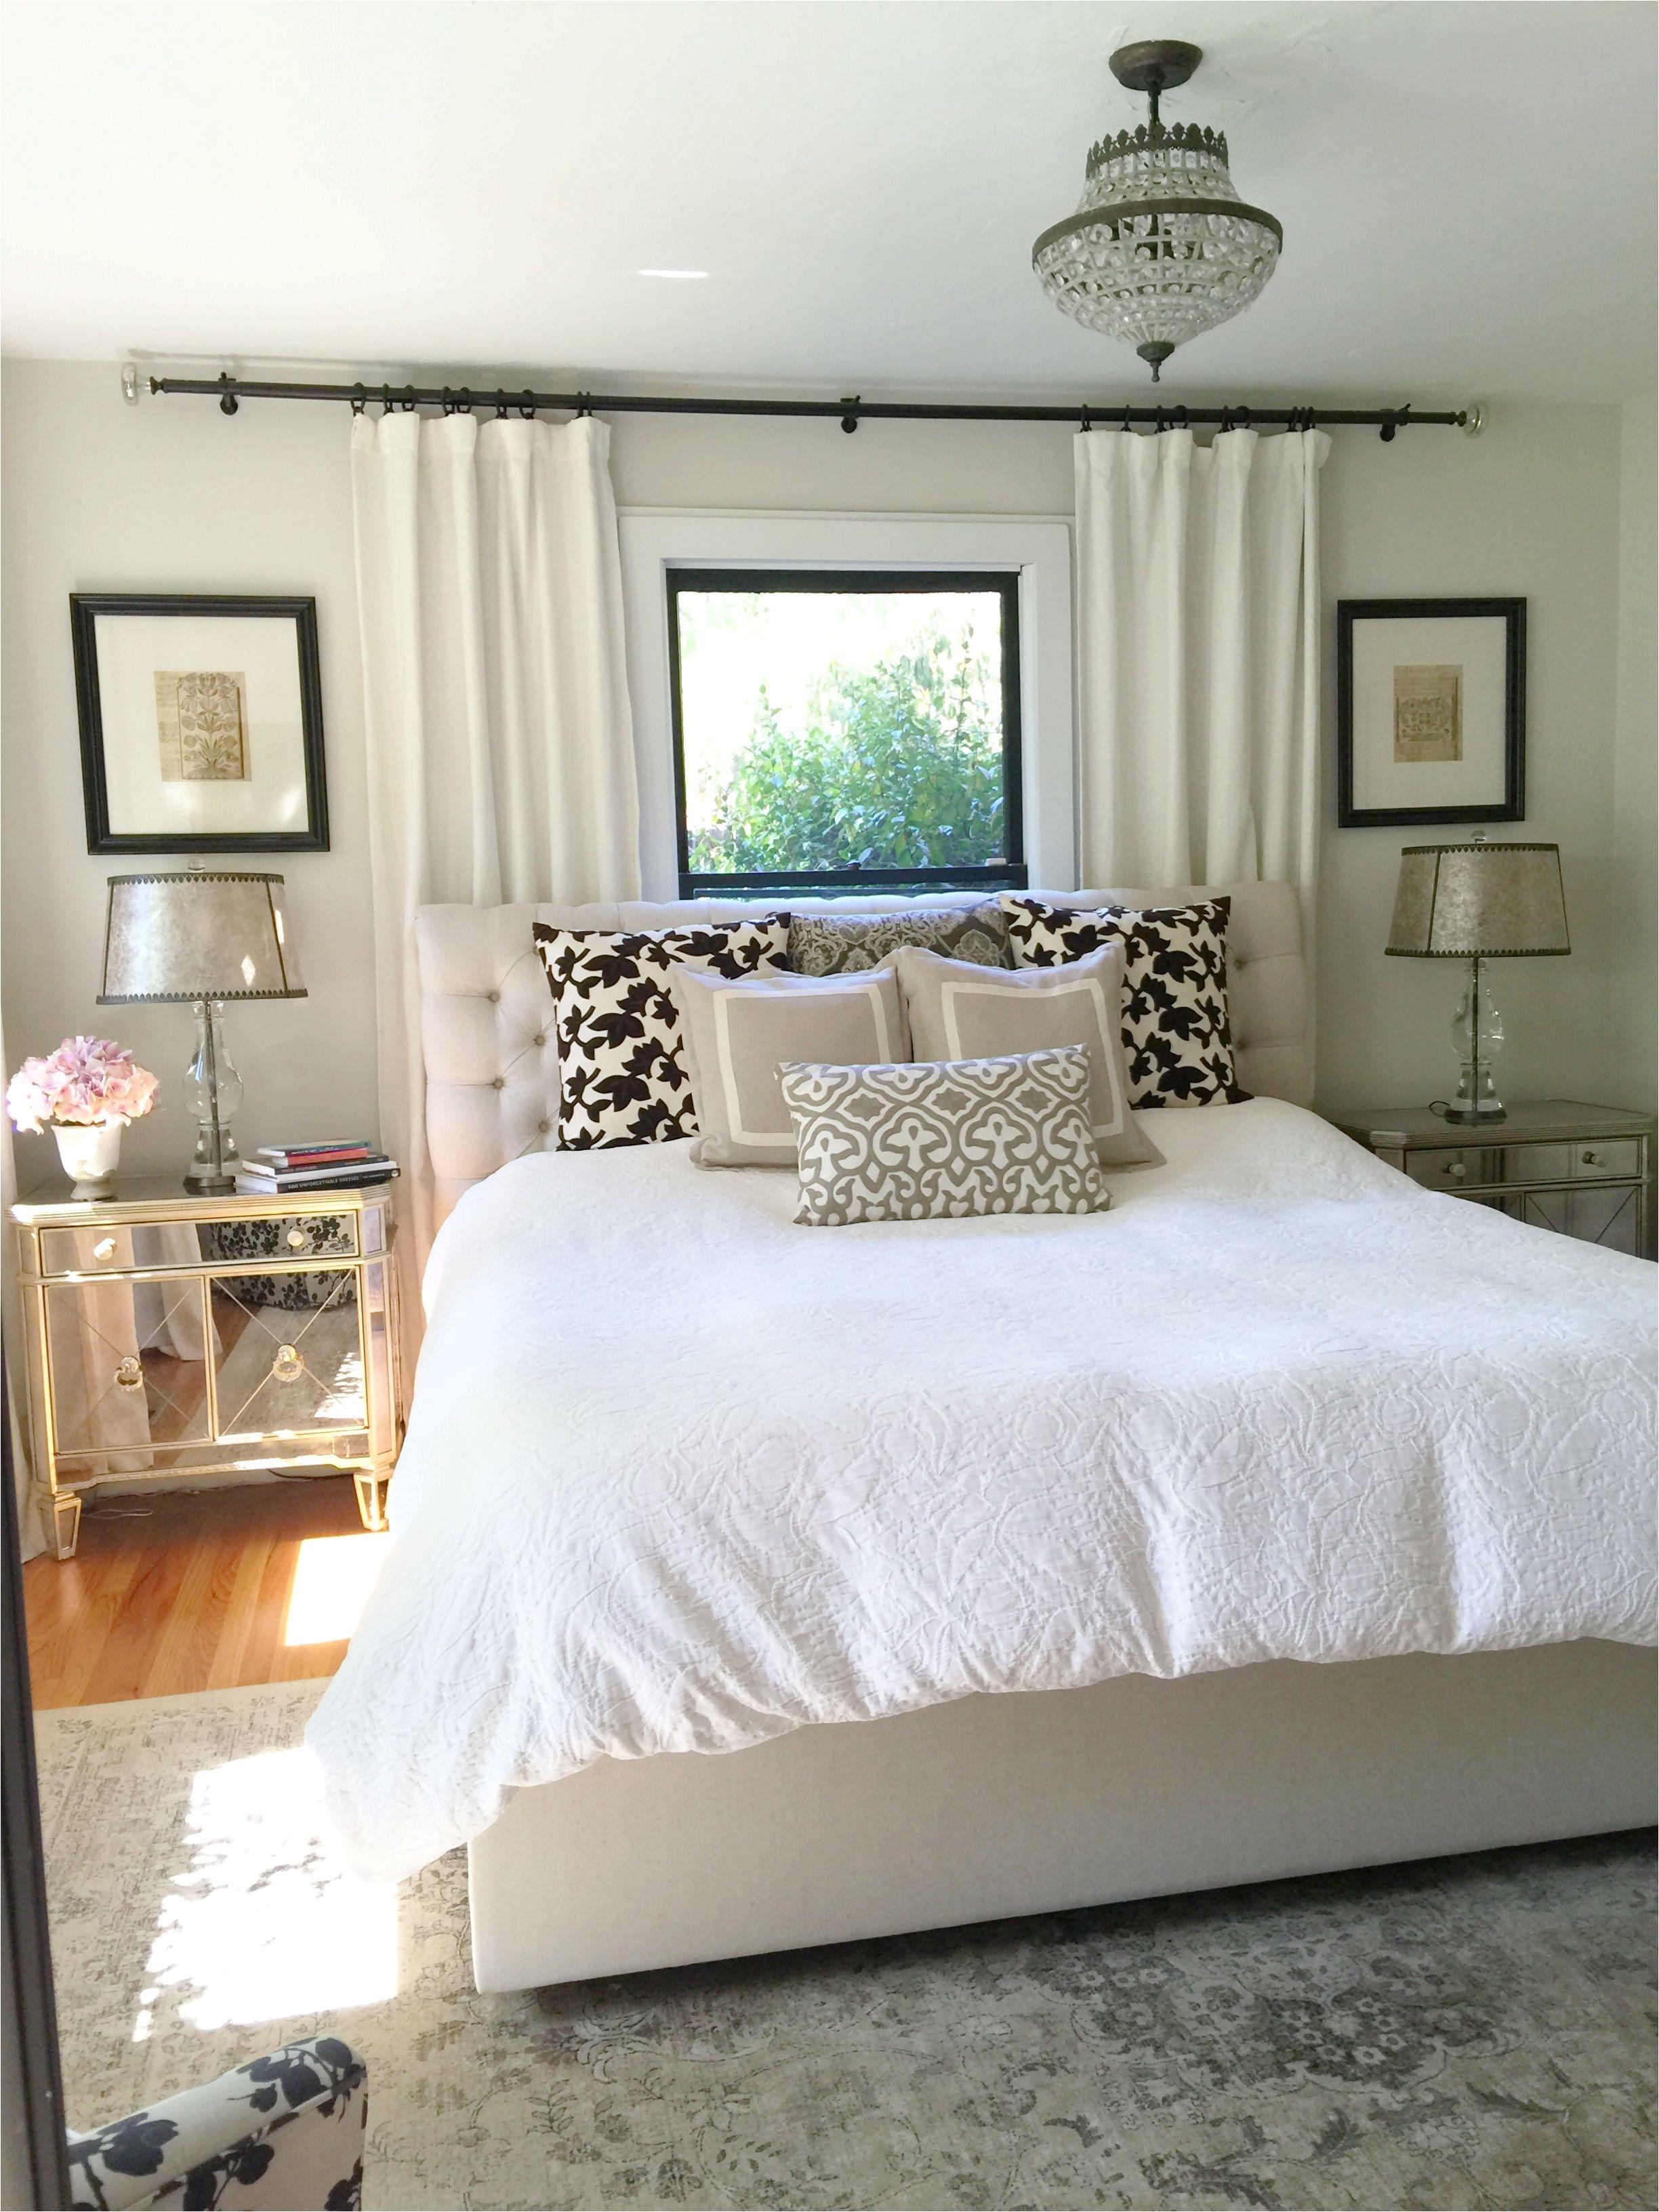 Neutral bedroom Window behind bed Bedroom window treatments Paint is Benjamin Moore winds breath